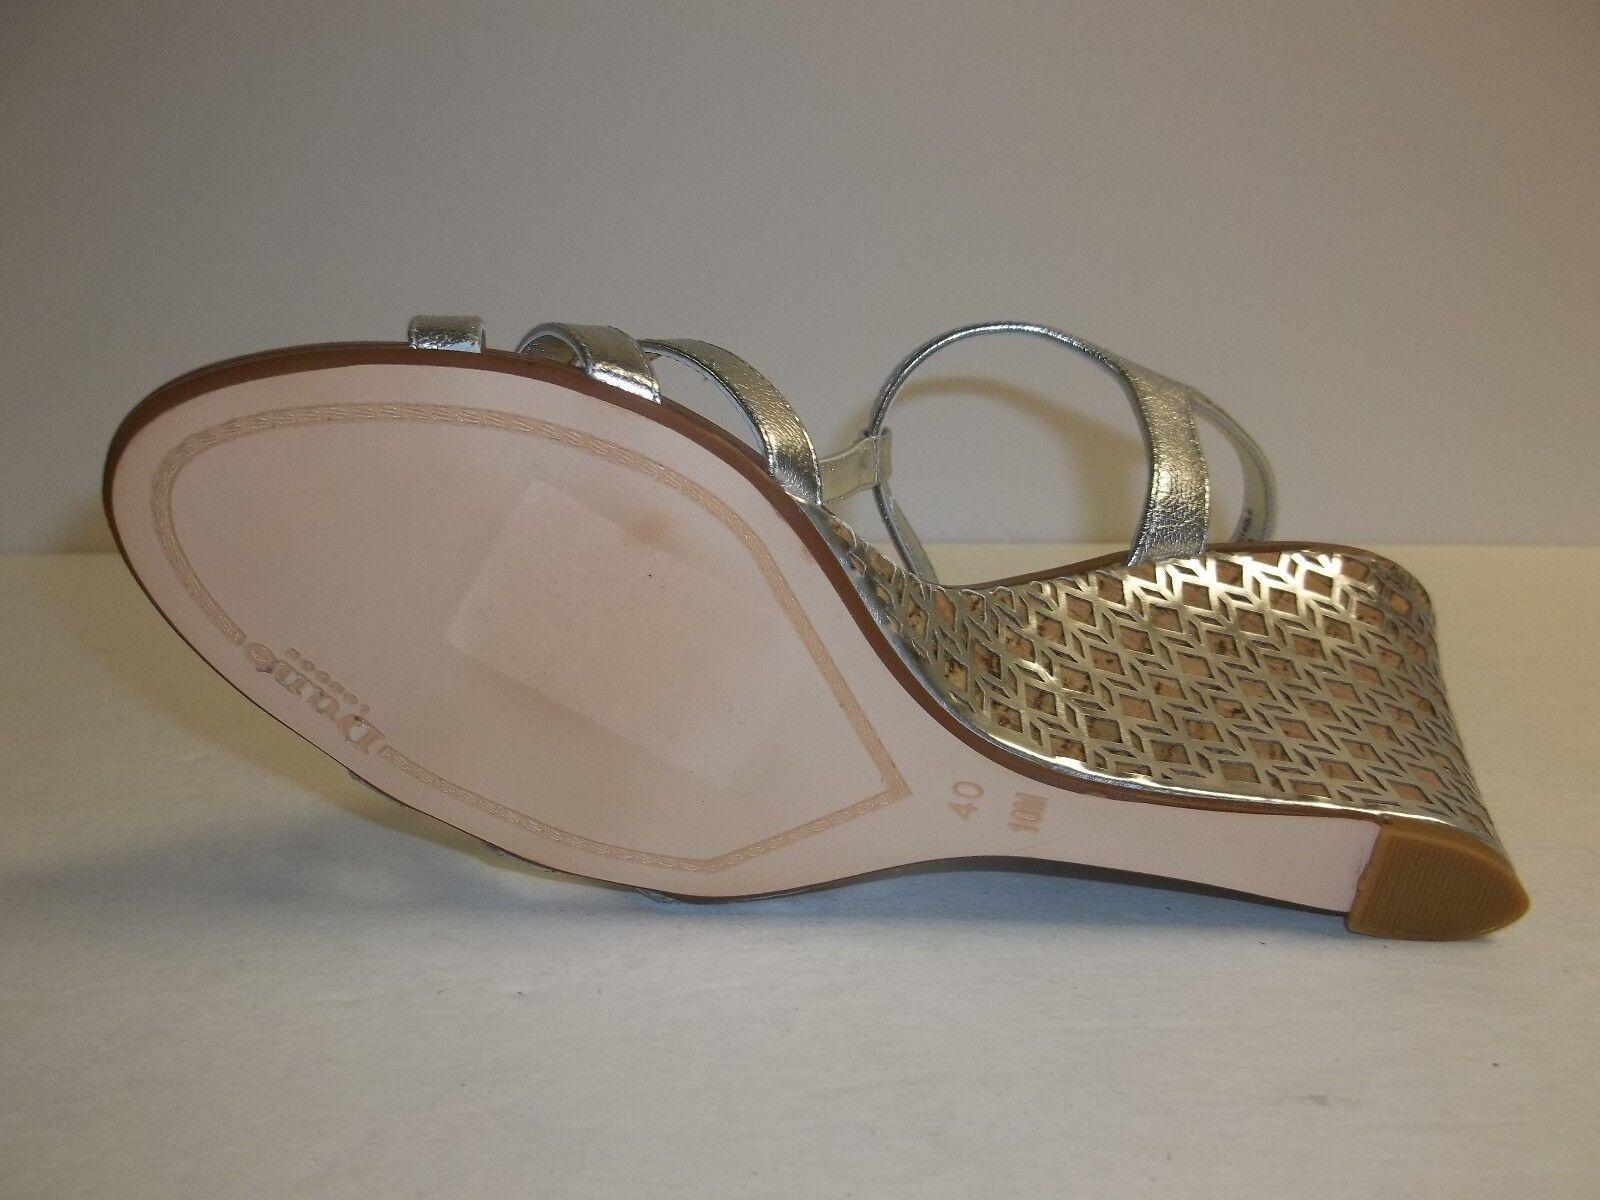 Dune London Größe 10 New M Gately Silver Leder Laser Wedge Sandales New 10 Damenschuhe Schuhes ae78c2